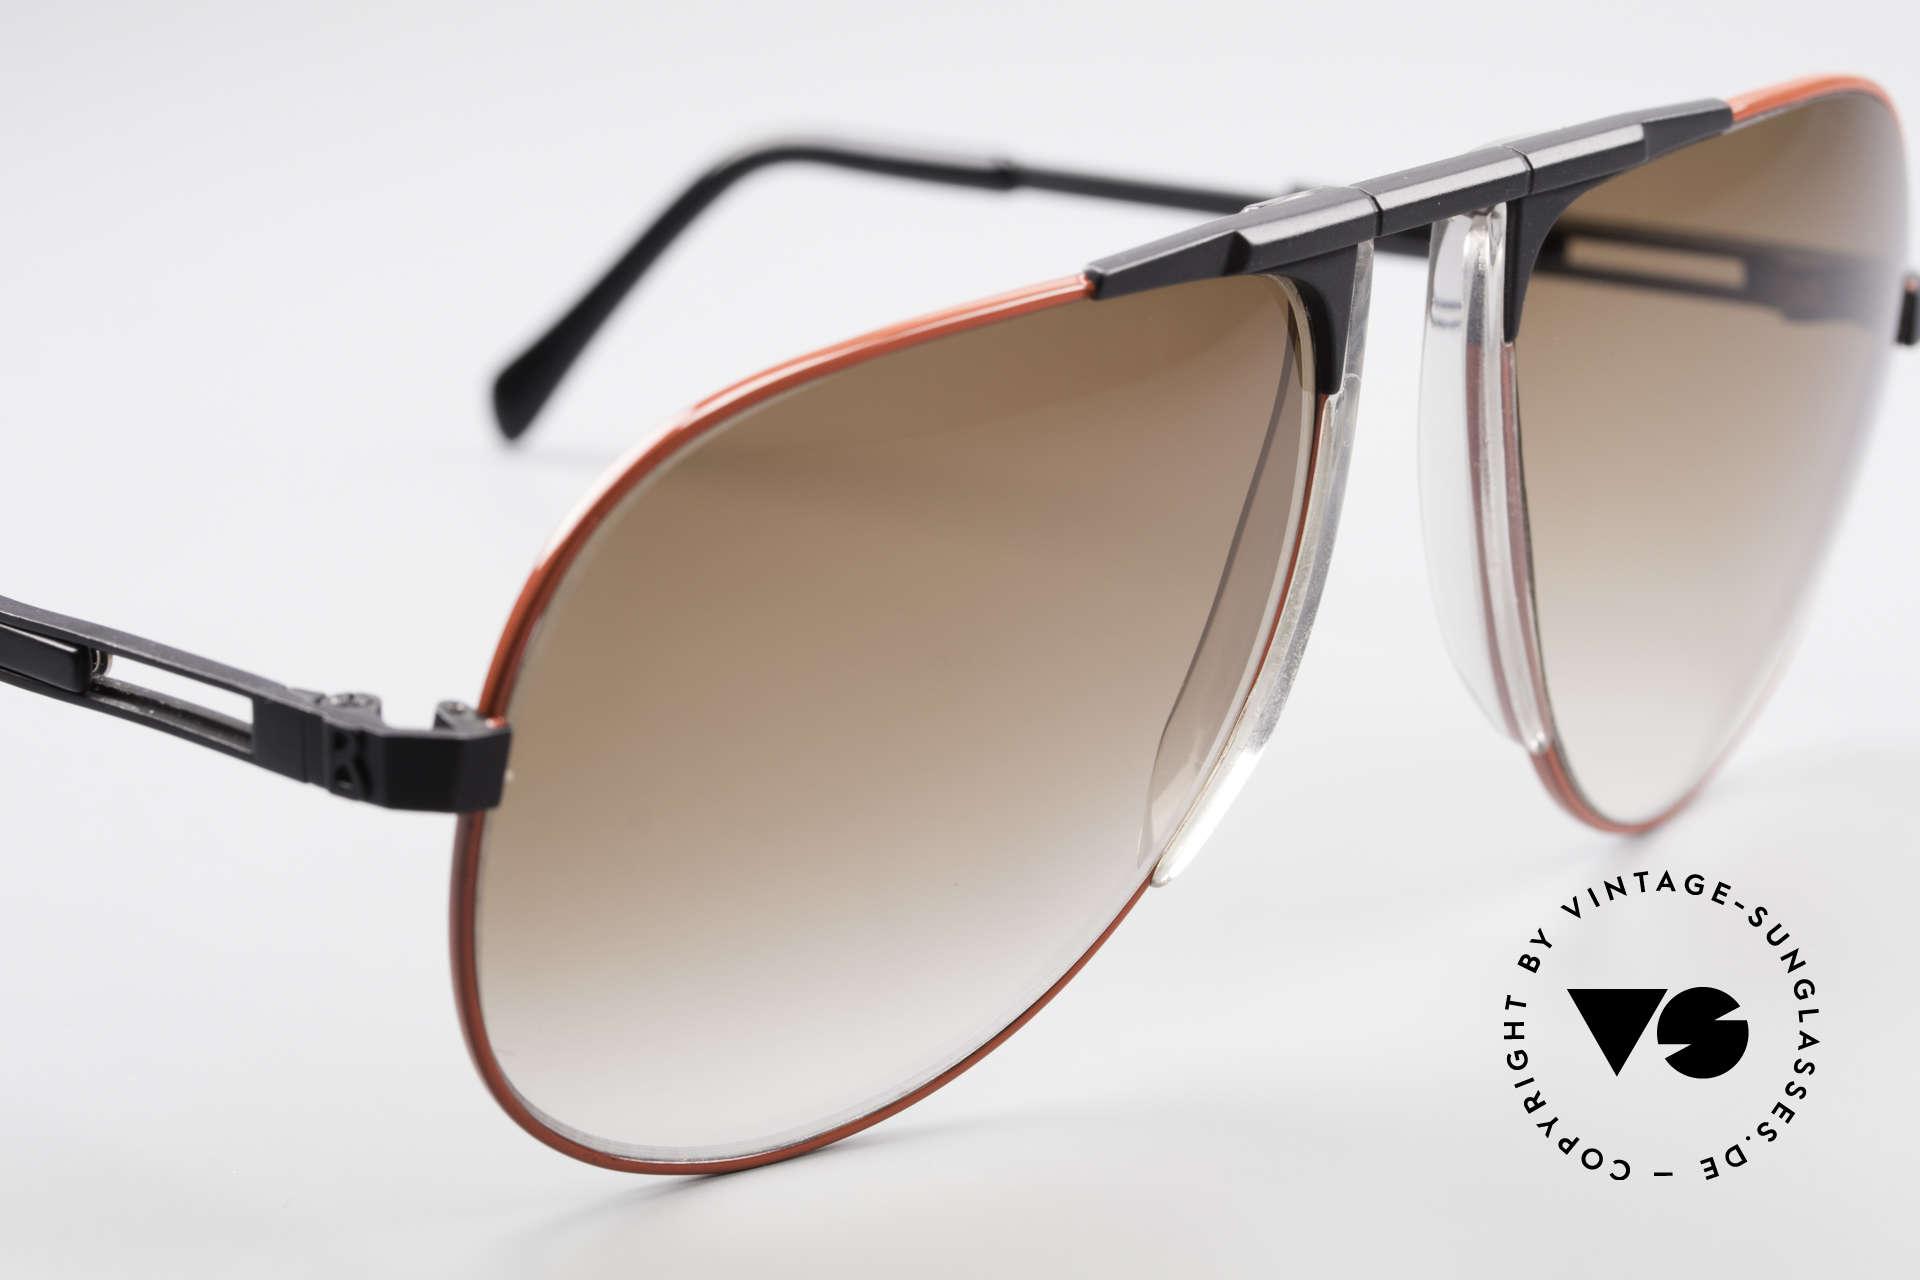 Willy Bogner 7011 Adjustable 80's Sunglasses, unworn (like all our vintage sunglasses by W. BOGNER), Made for Men